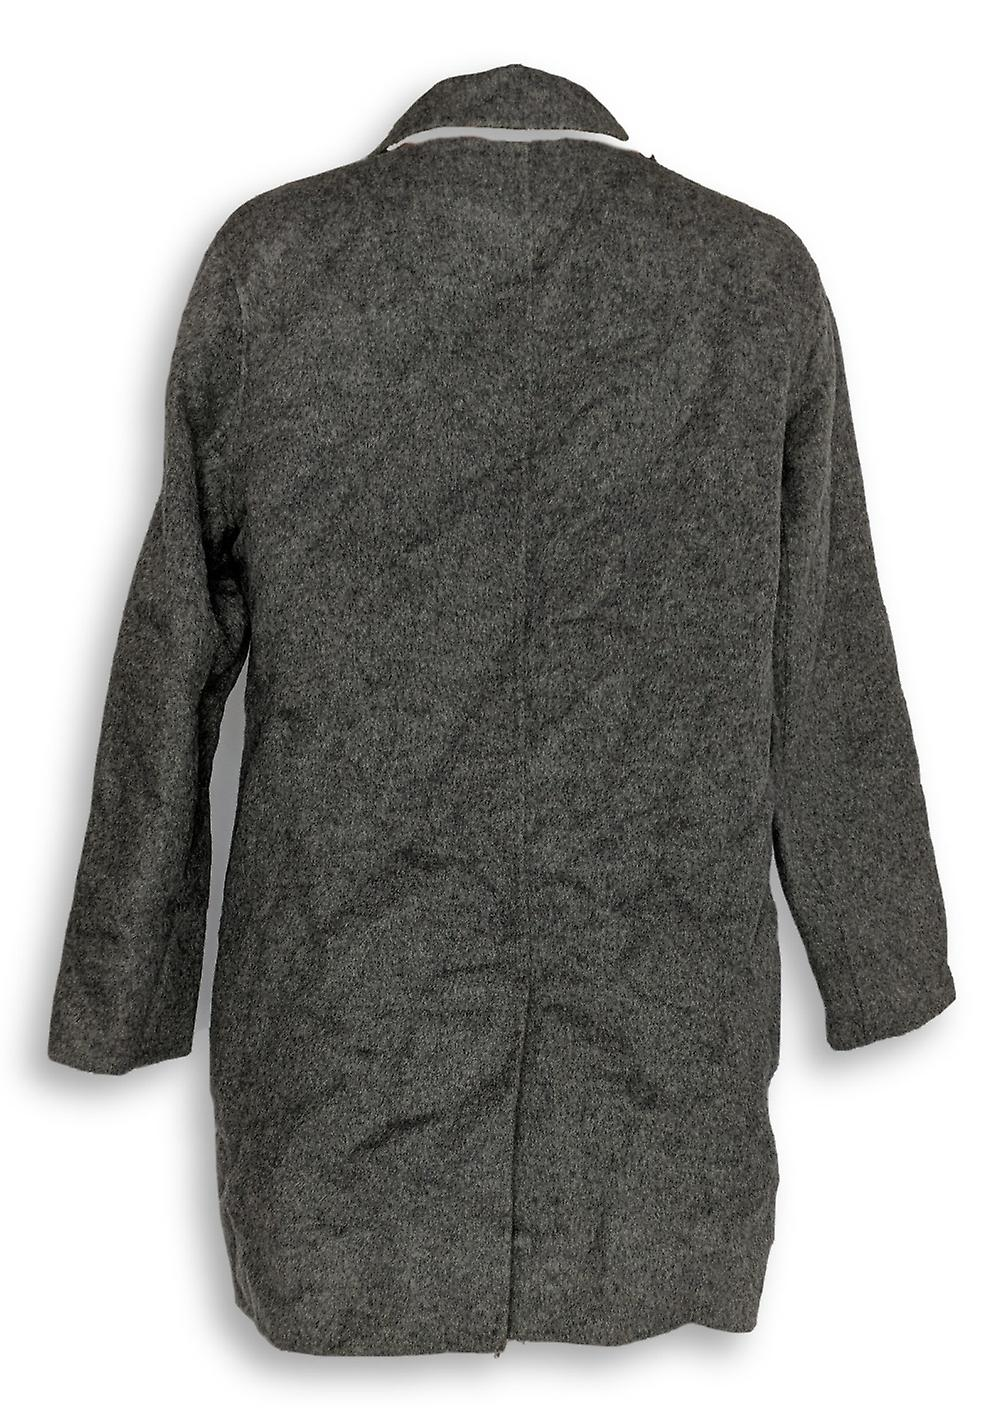 LOGO by Lori Goldstein Women's Button Front Coat Brown A283033